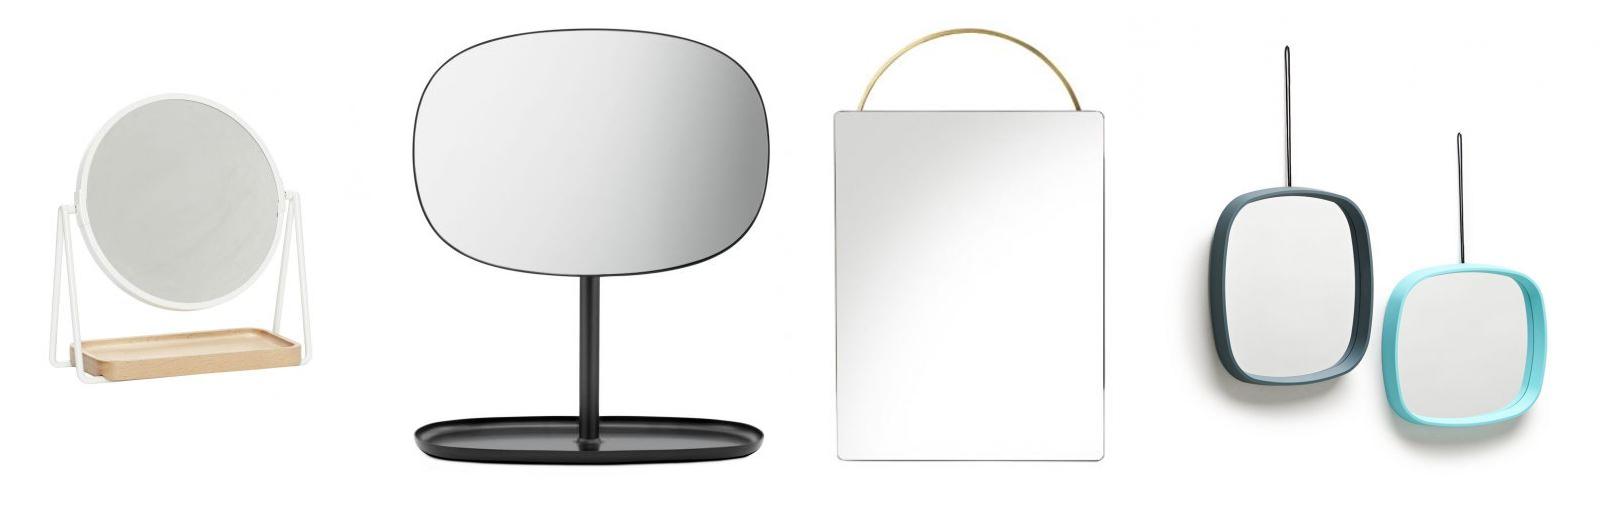 Dizajnové zrkadlá, stolné zrkadlá